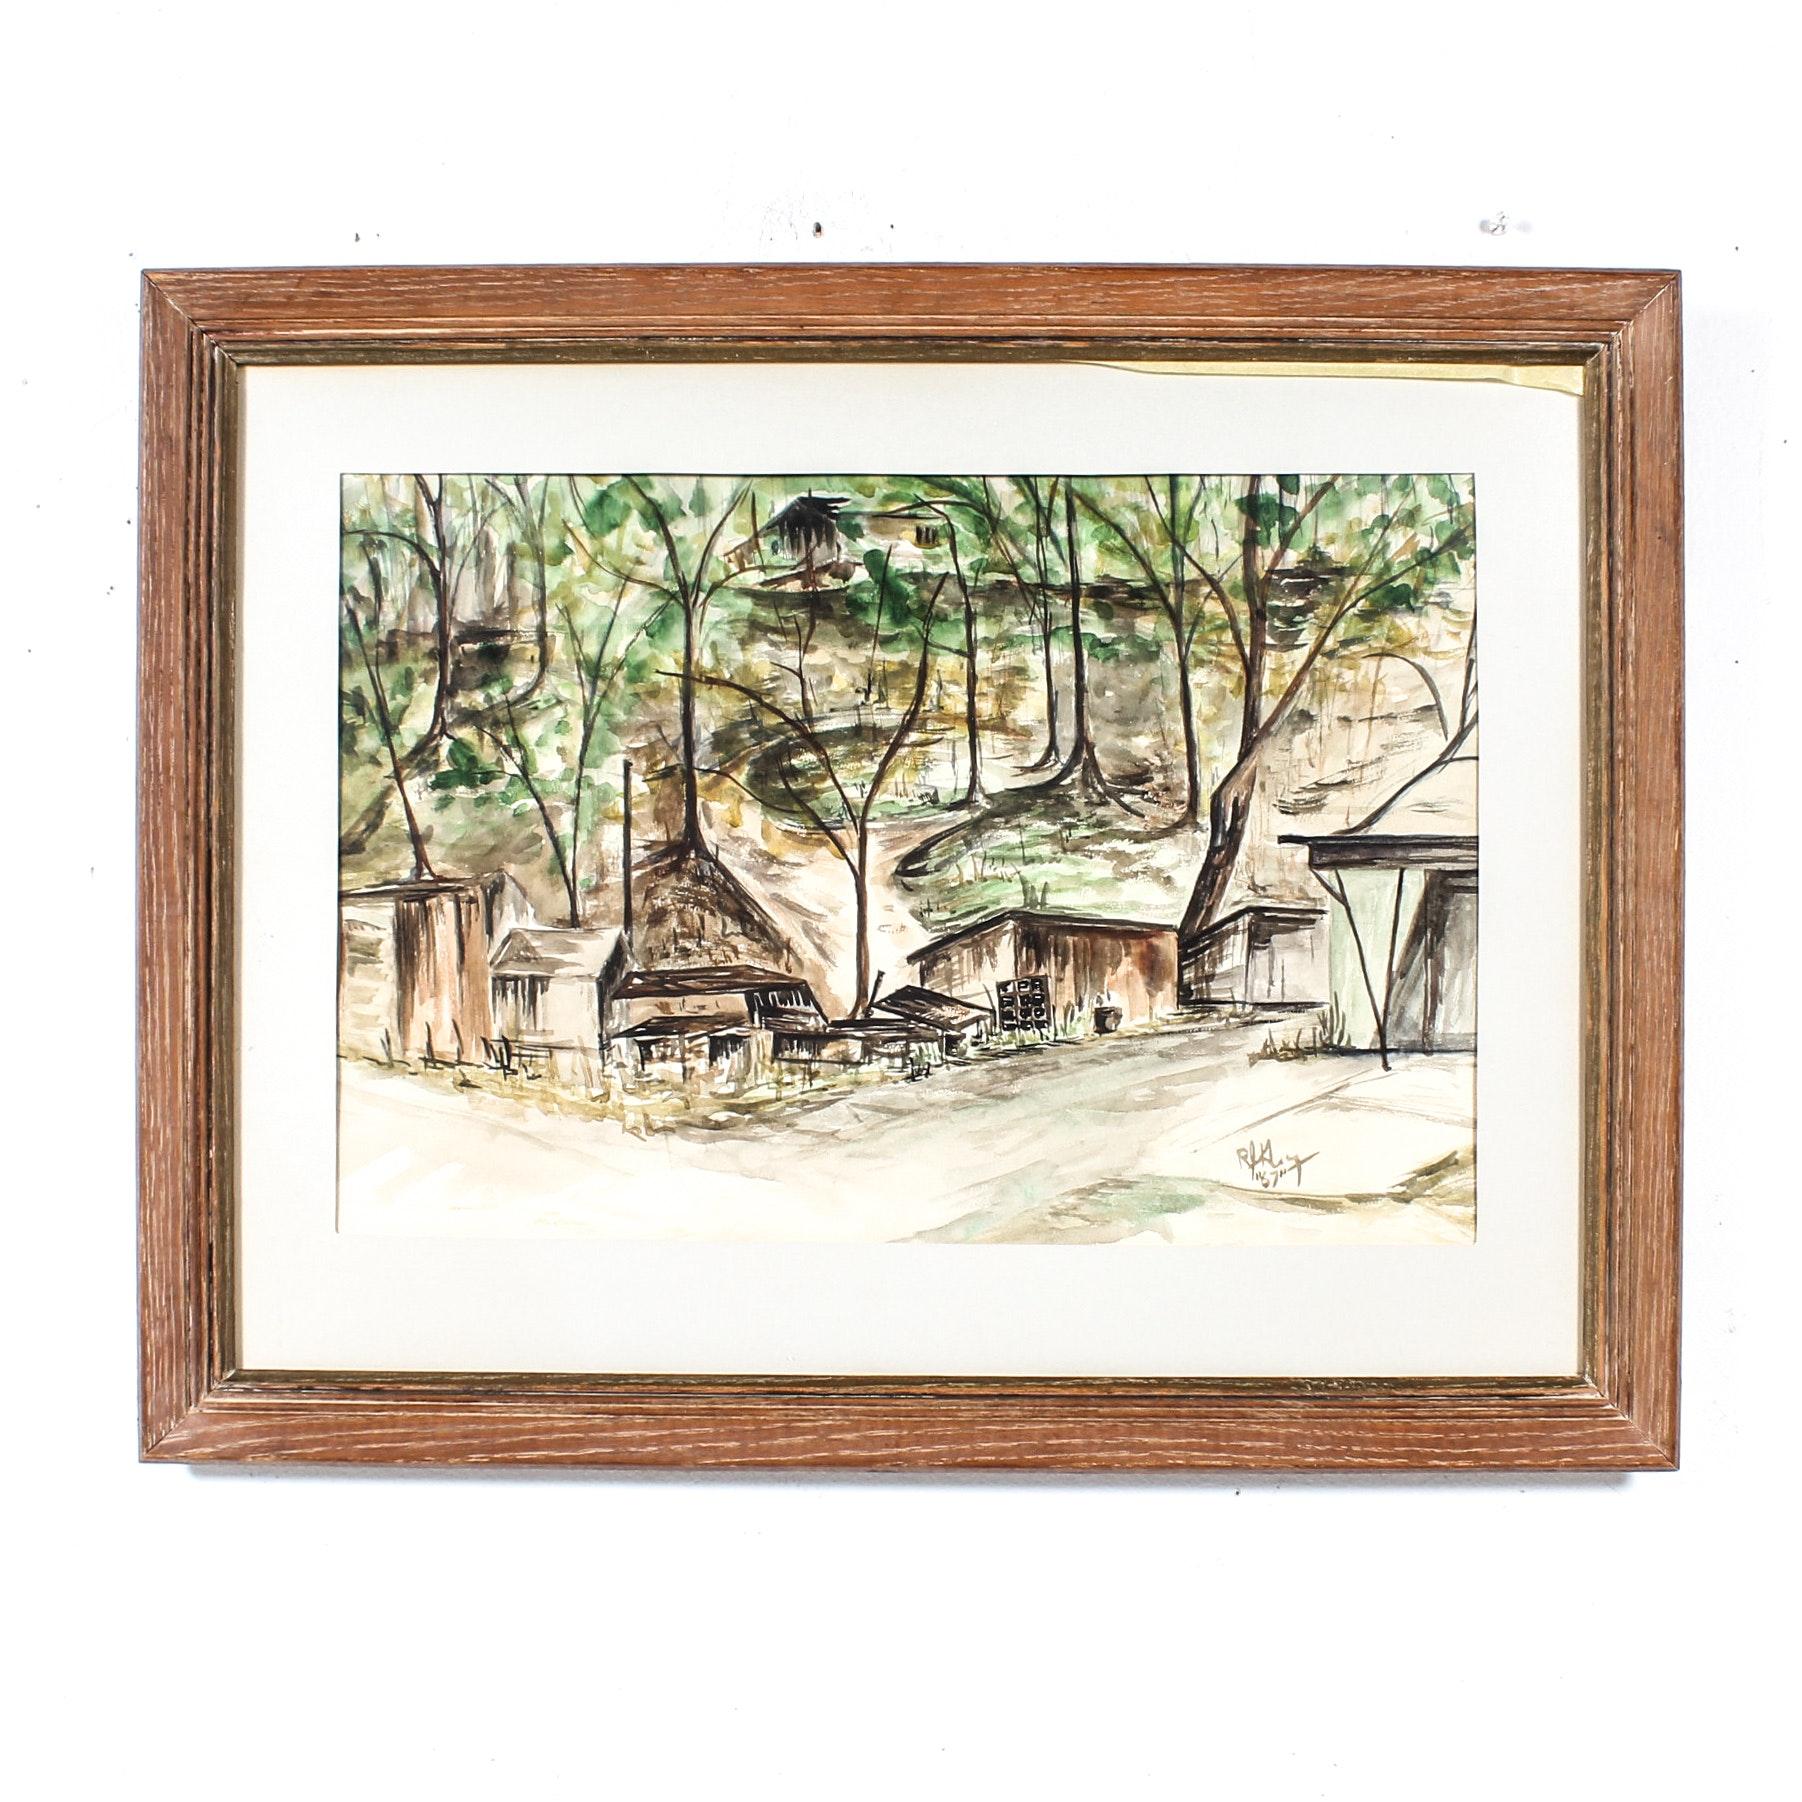 Watercolor Painting of Rustic Hillside